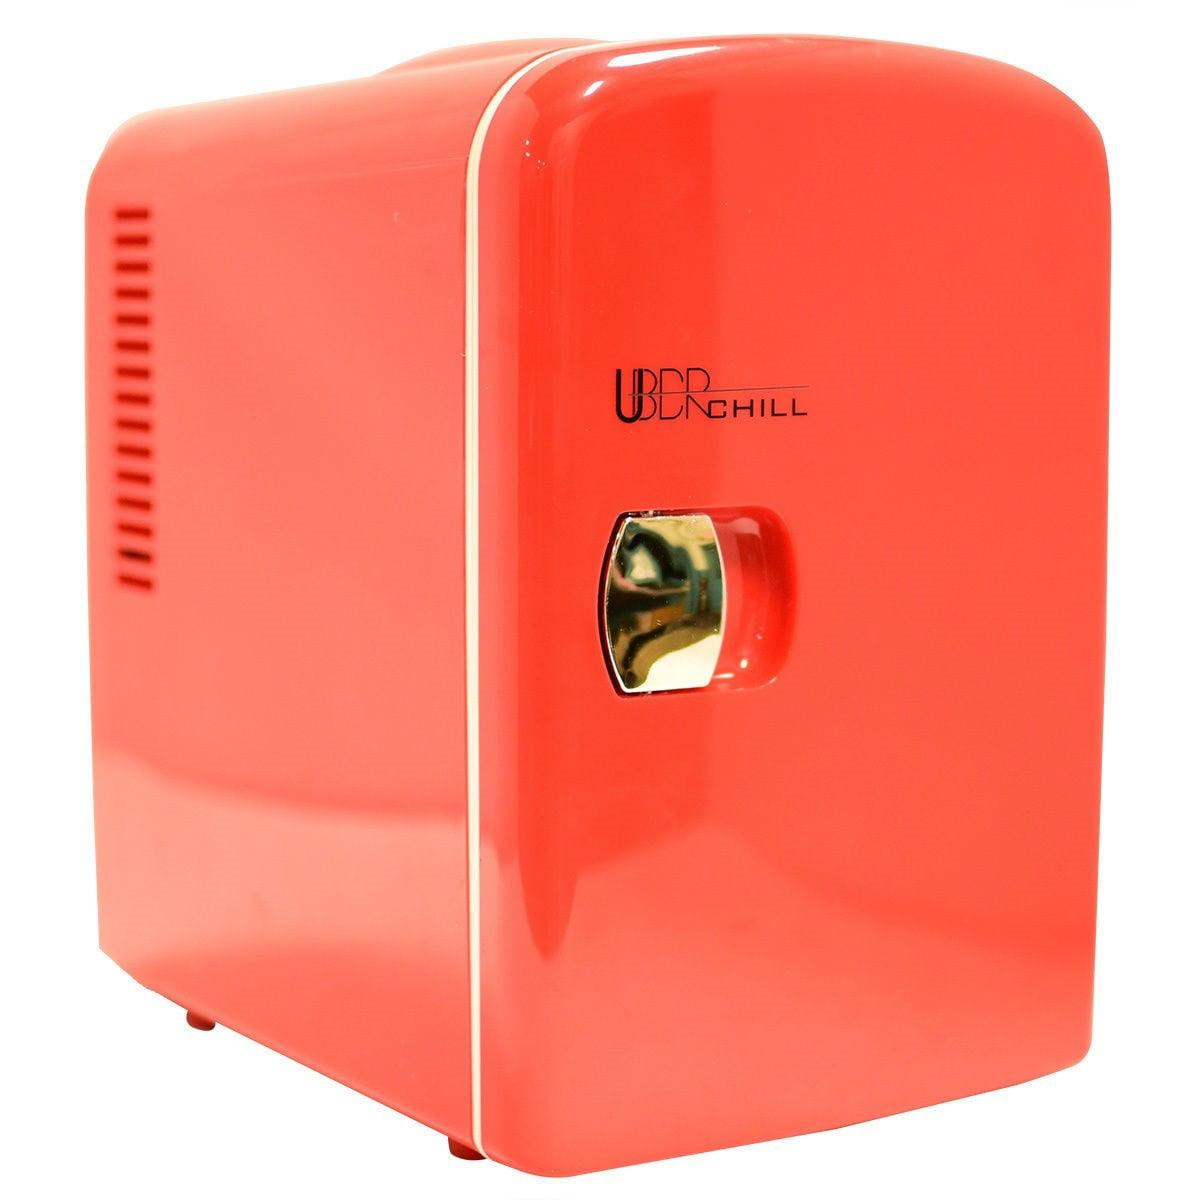 Uber Appliance UB-CH1 Chill 6-can Retro Portable Mini Fridge, Red